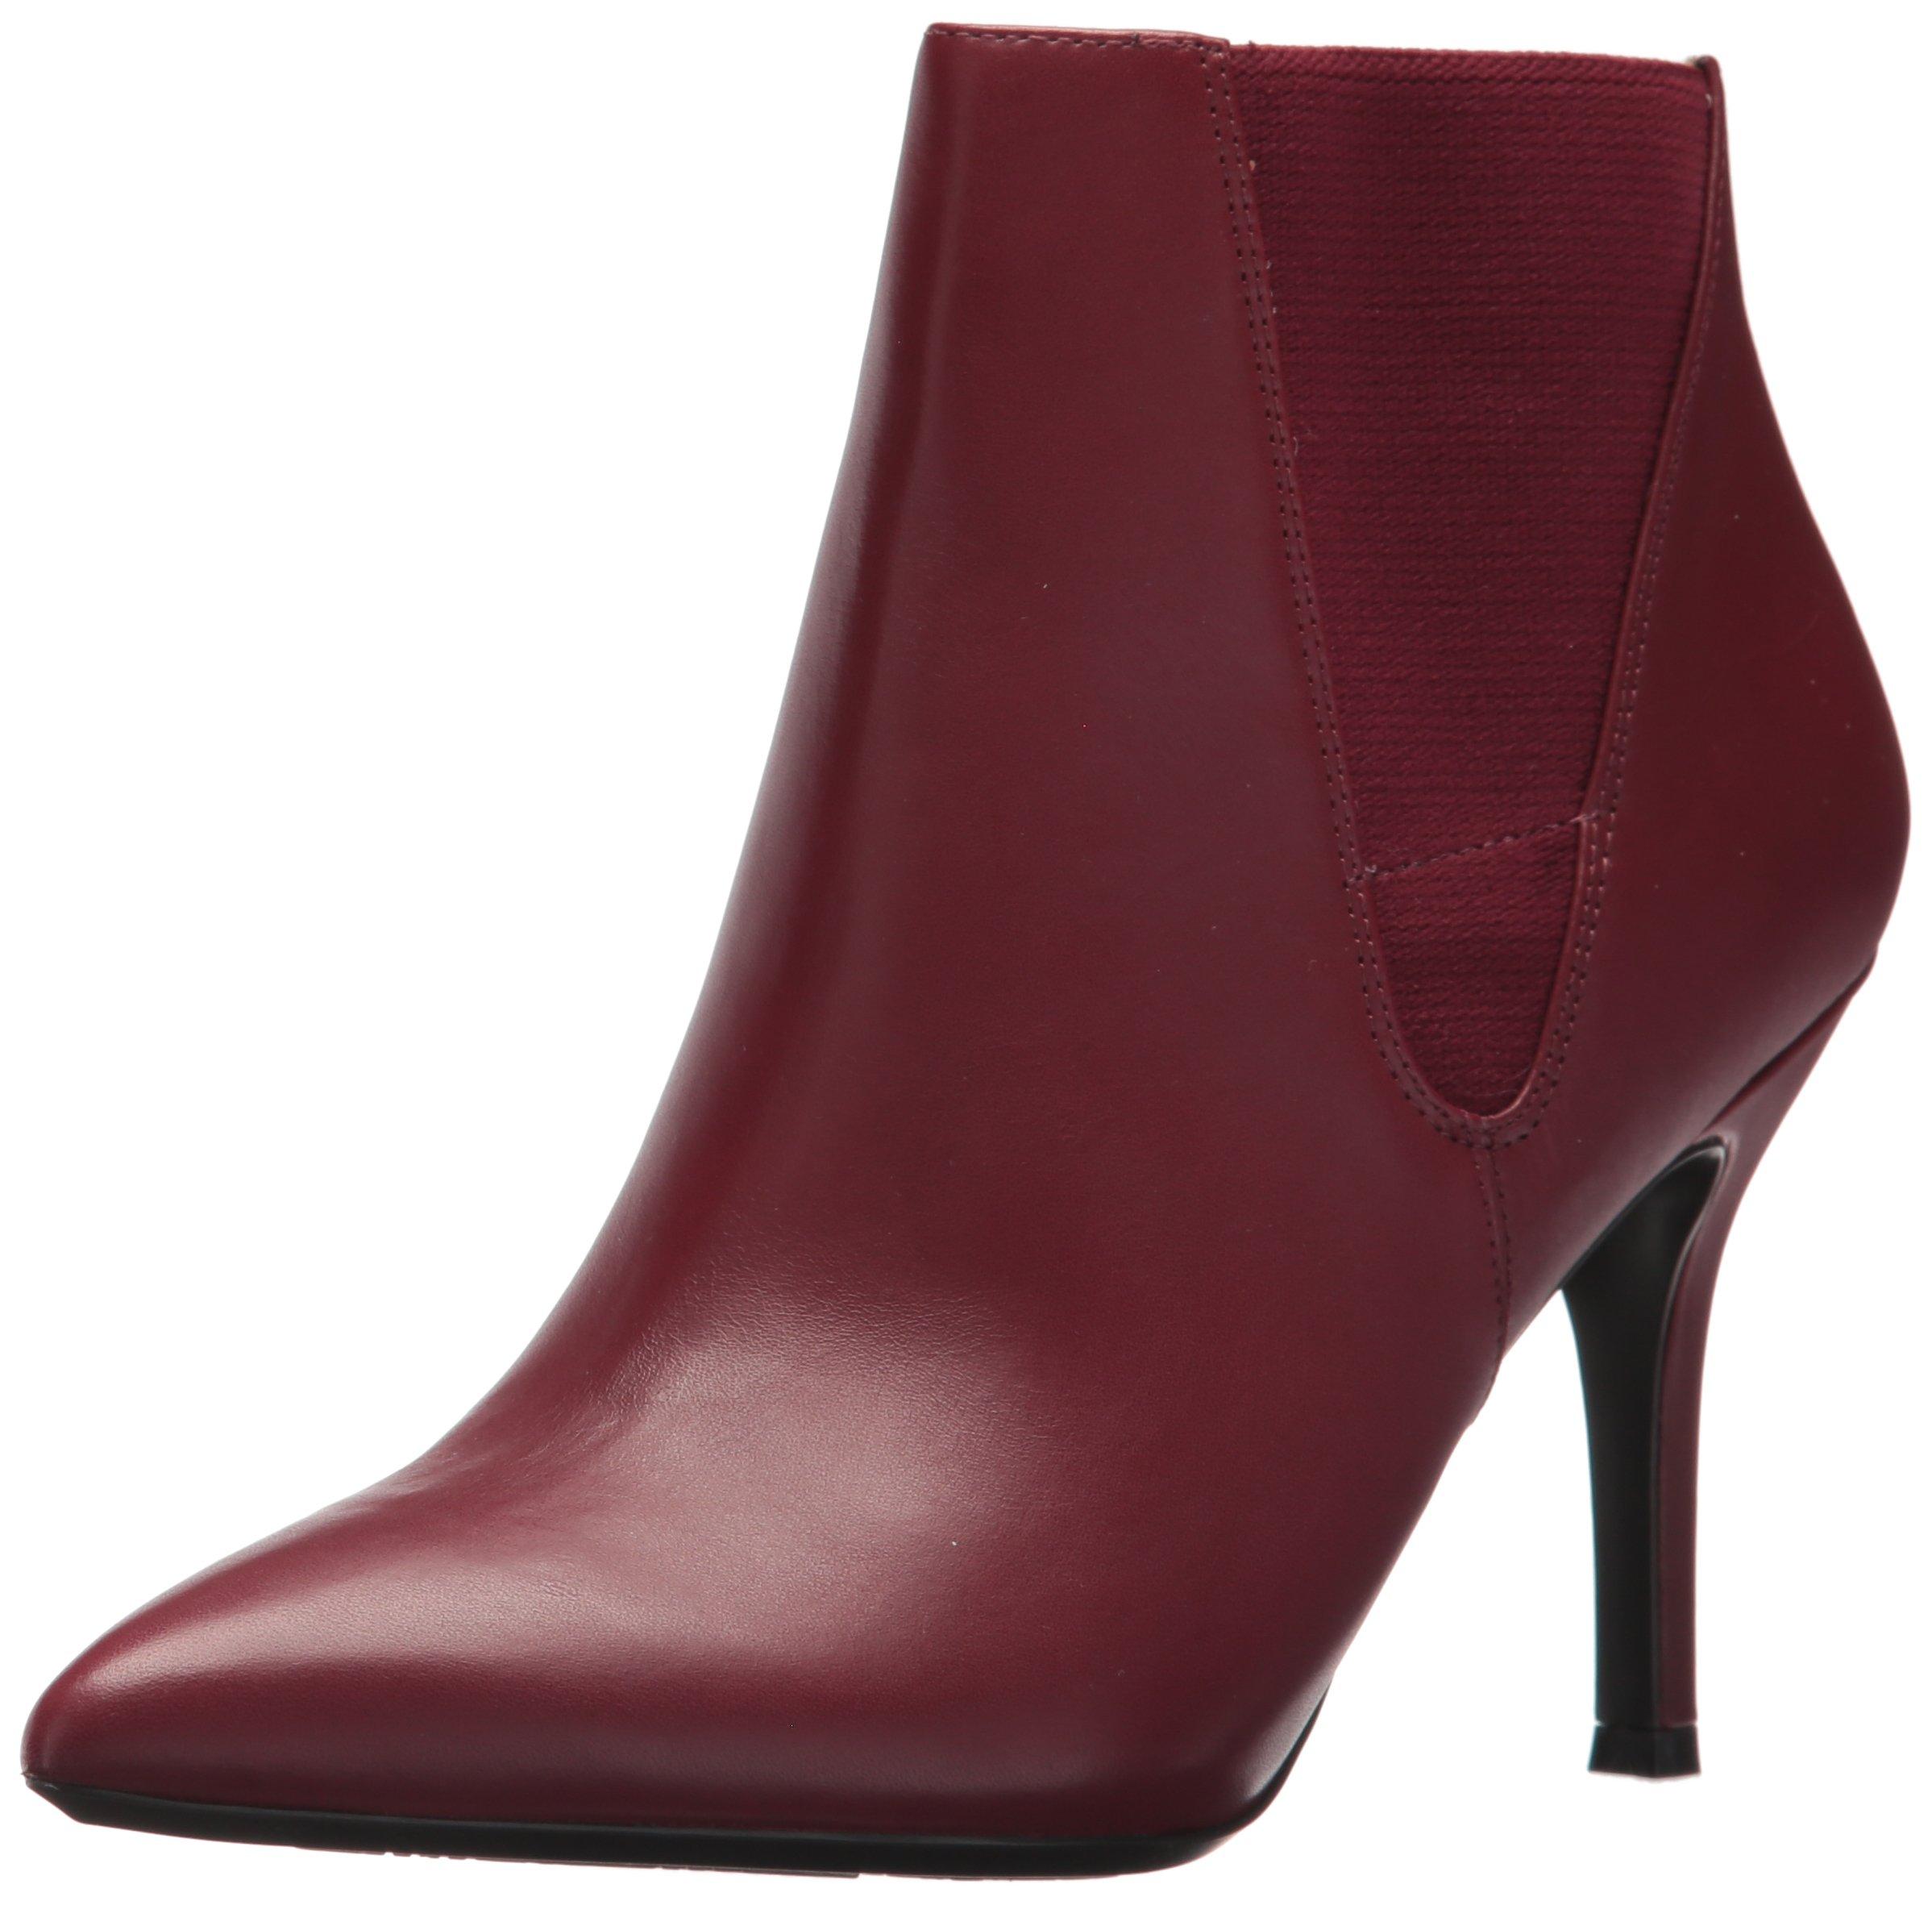 Nine West Women's FRONT9X9, Wine/Wine Leather, 9 M US